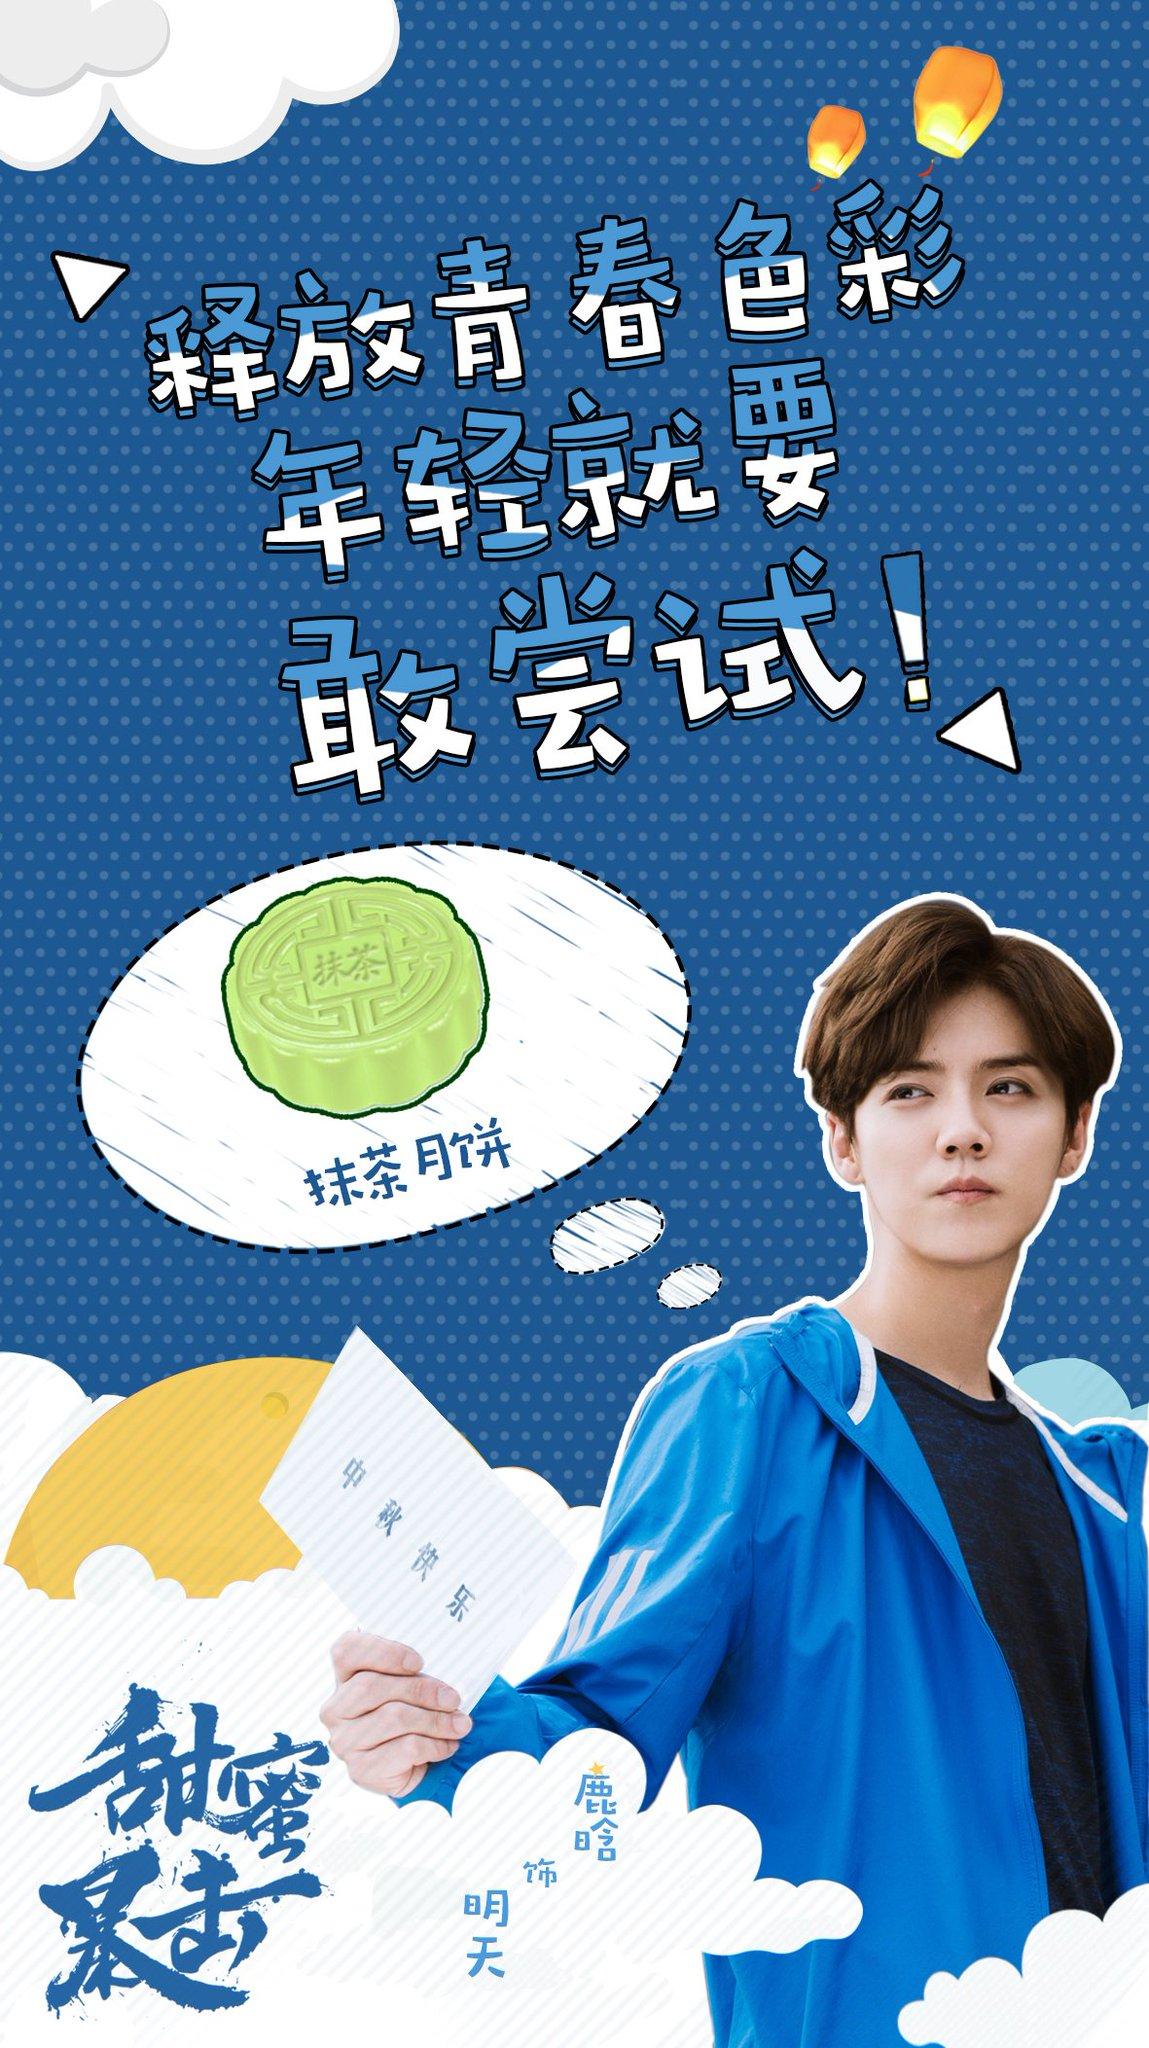 [17.10.04] Weibo de la serie de televisión 'Sweet Punch' #LuHan #LuHanSweetCombat https://t.co/TAMr34hPkD cr.电视剧甜蜜暴击 https://t.co/sf7znRWxIW